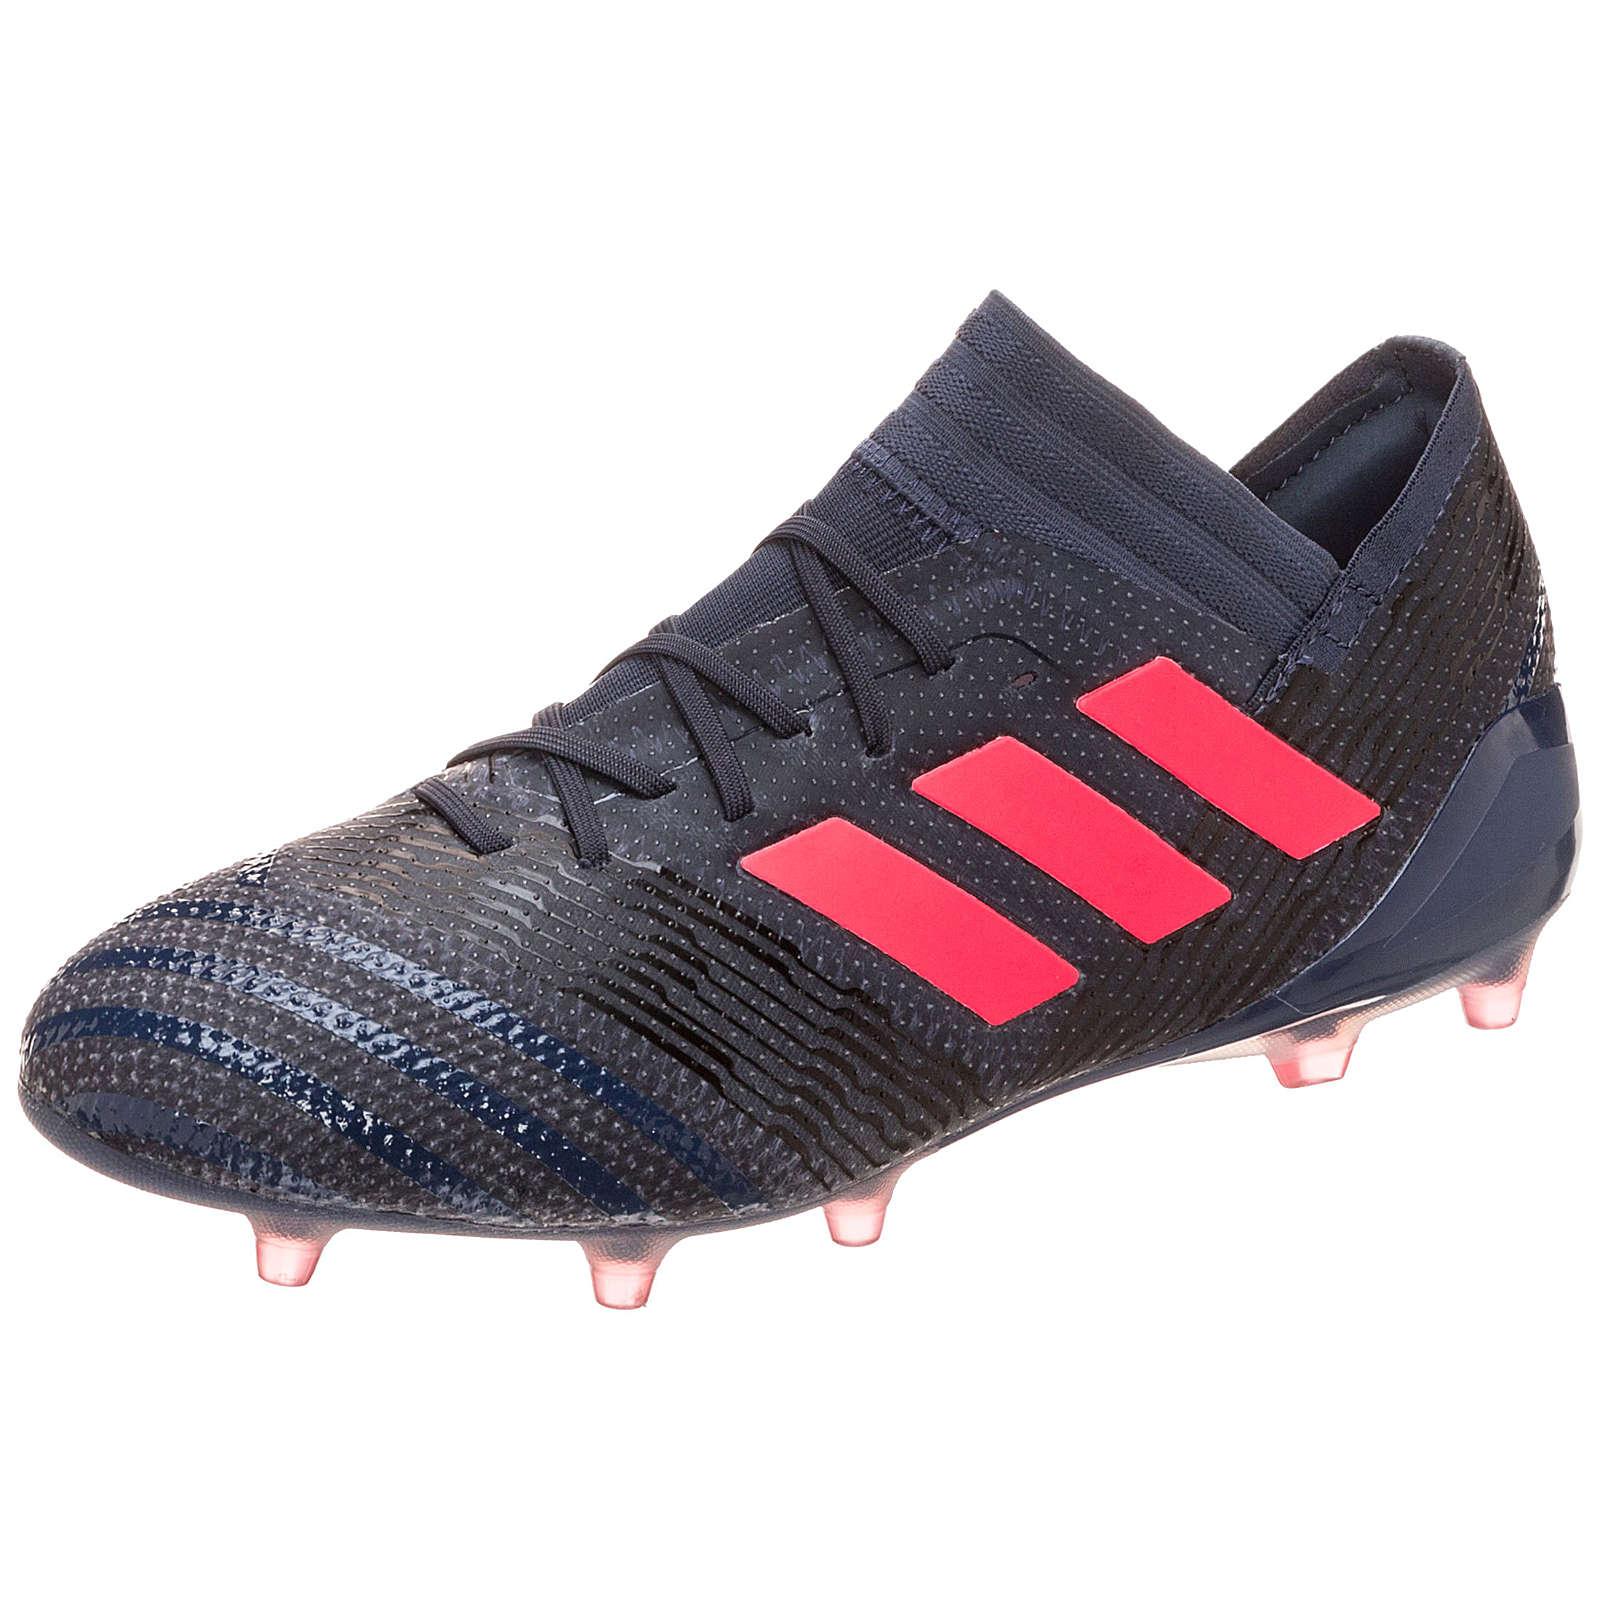 adidas Performance Fußballschuhe Nemeziz 17.1 FG blau-kombi Damen Gr. 40